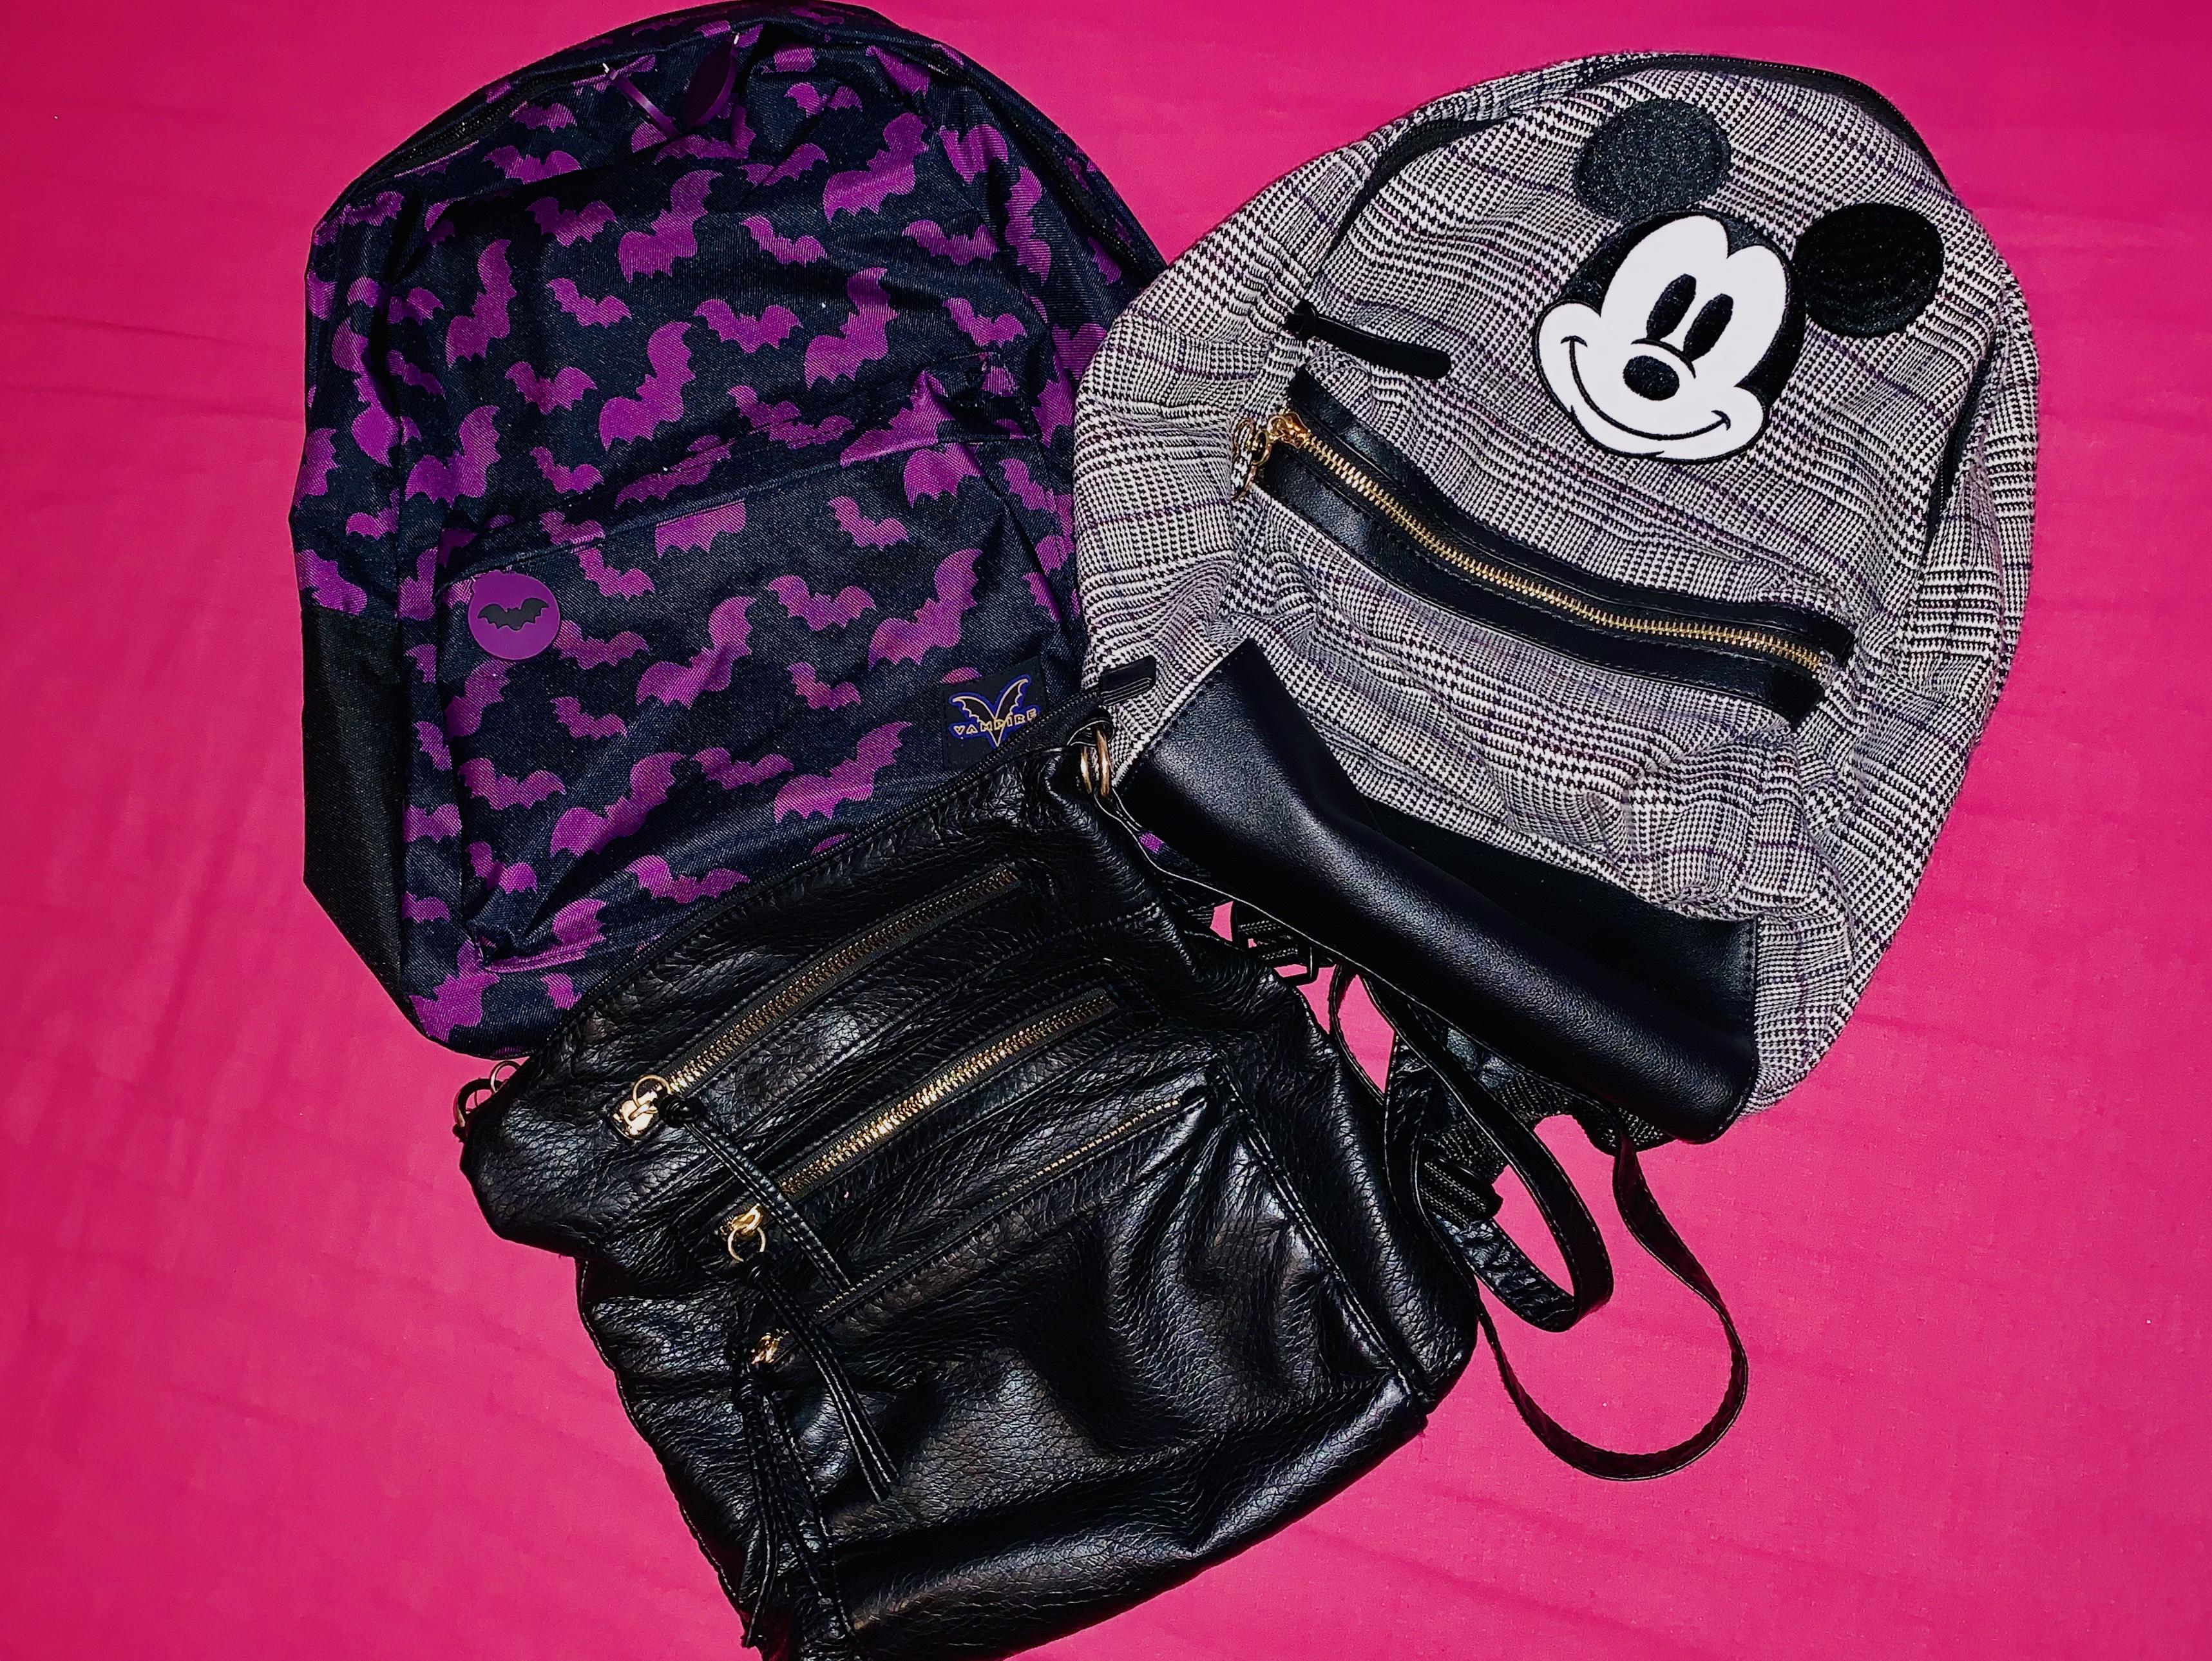 Theme-Park-Bag